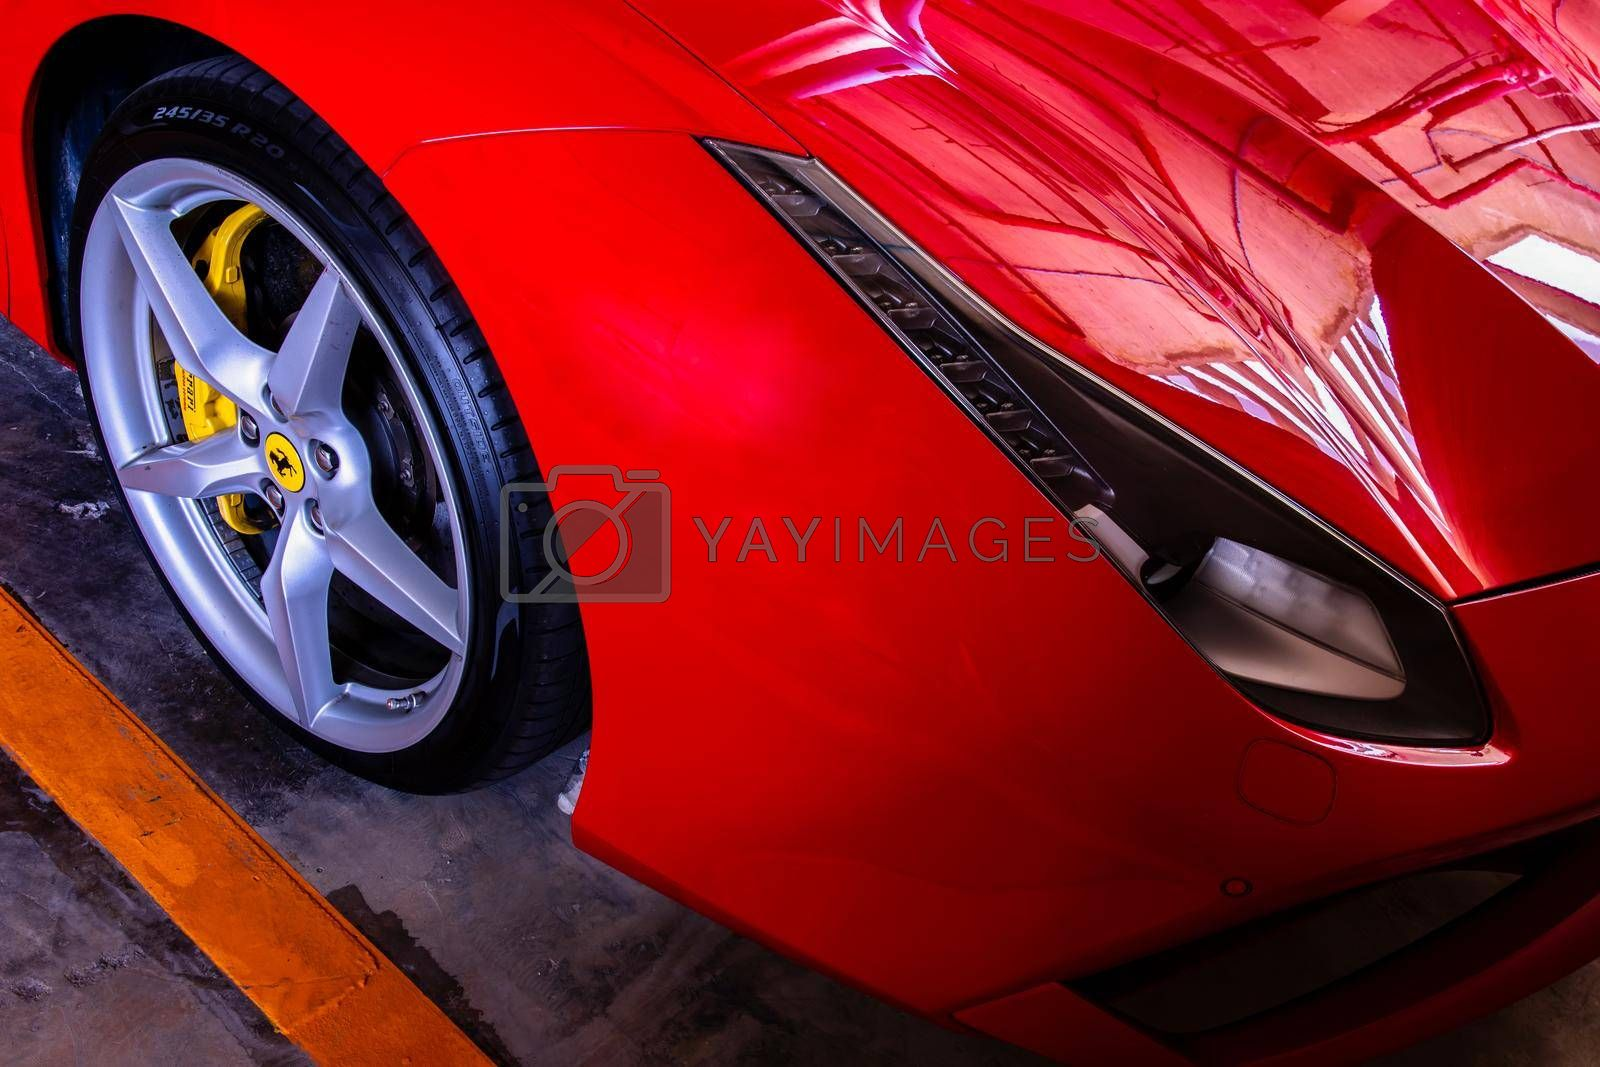 Bangkok, Thailand - 06 Jun 2021 : Close-up of Headlights, Wheel, and Rim of Red metallic Ferrari car. Selective focus.